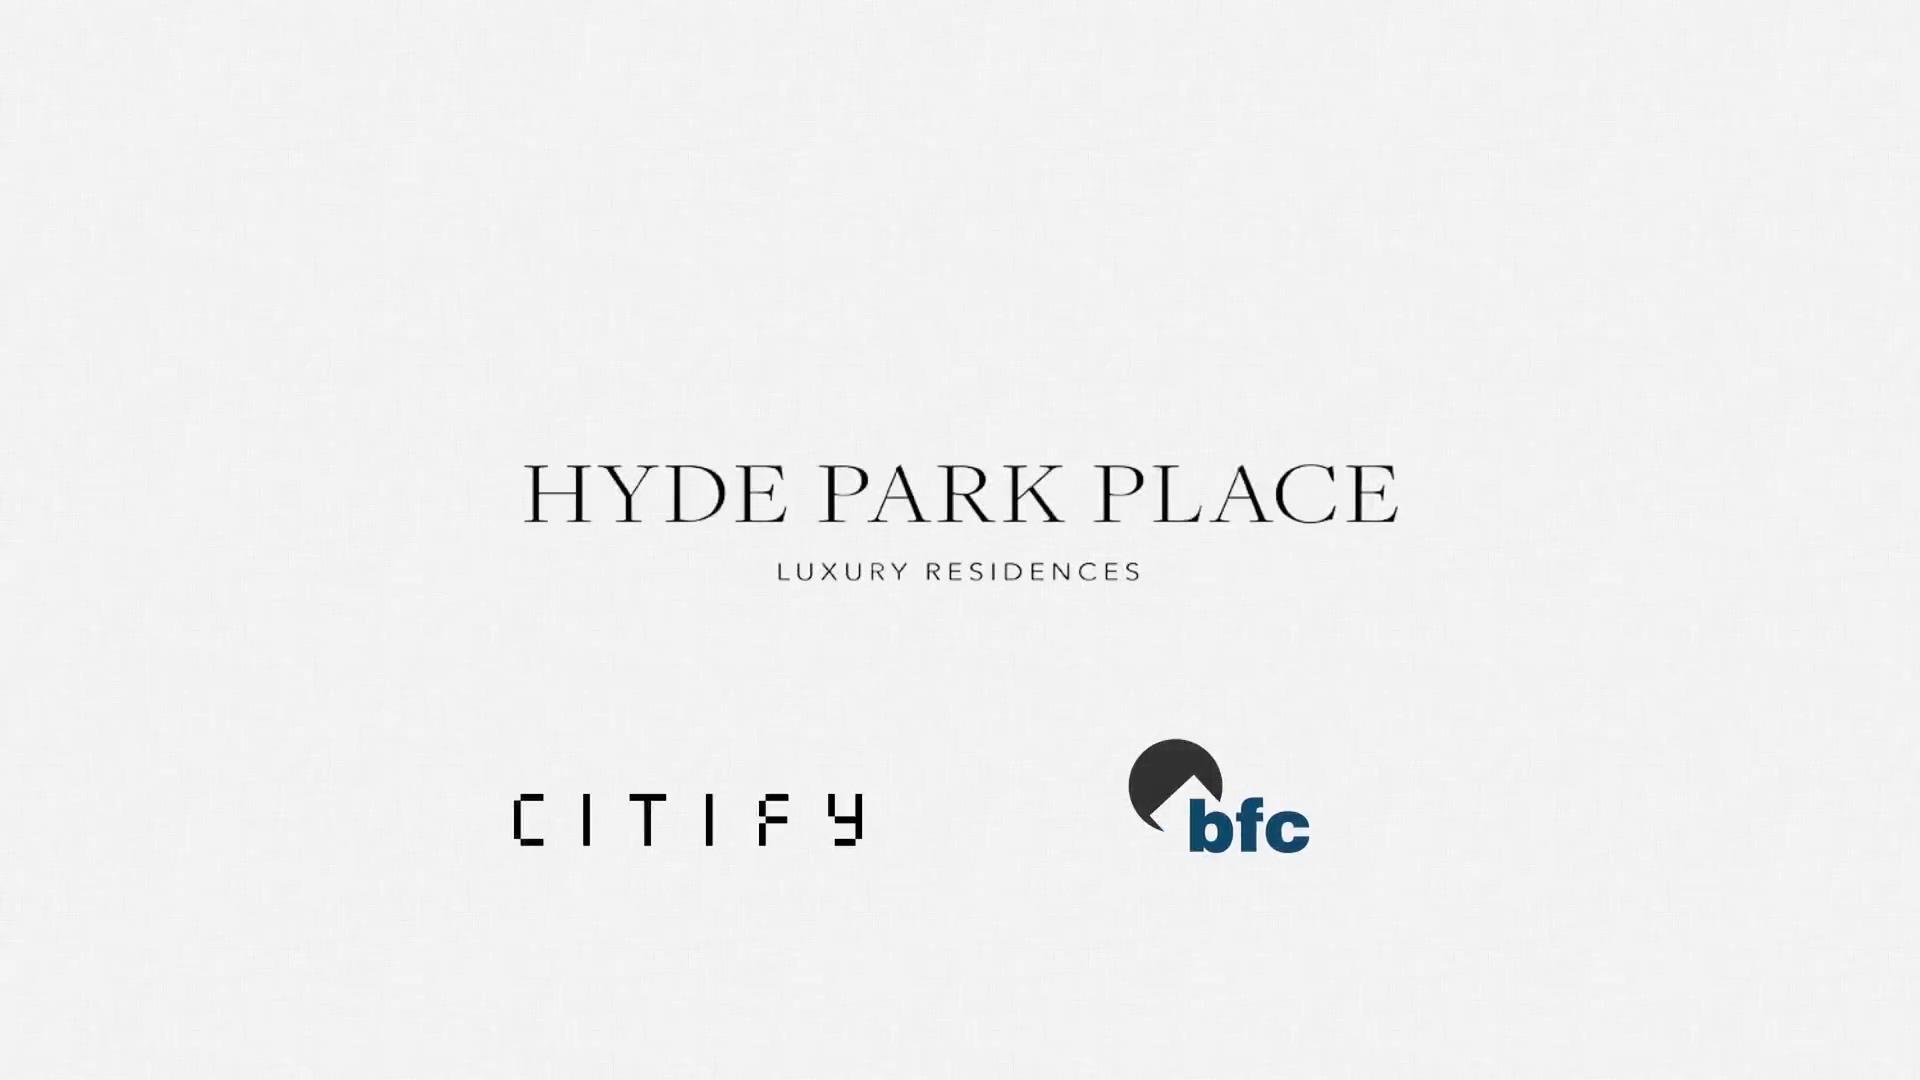 Citify - Hyde Park Place - November 2019